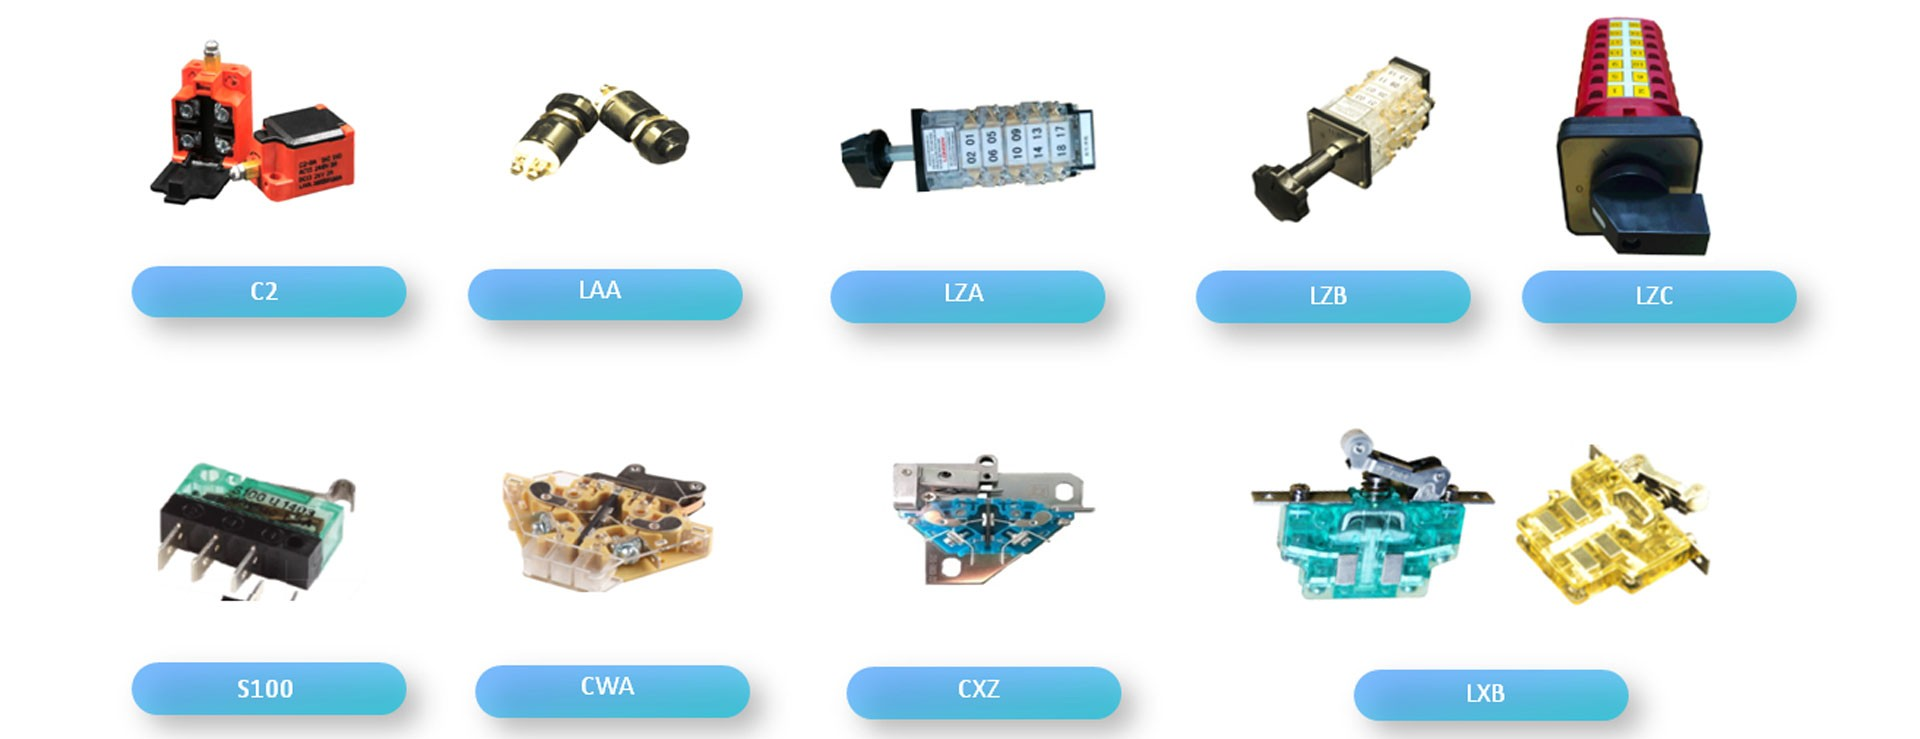 Plasthetics Products